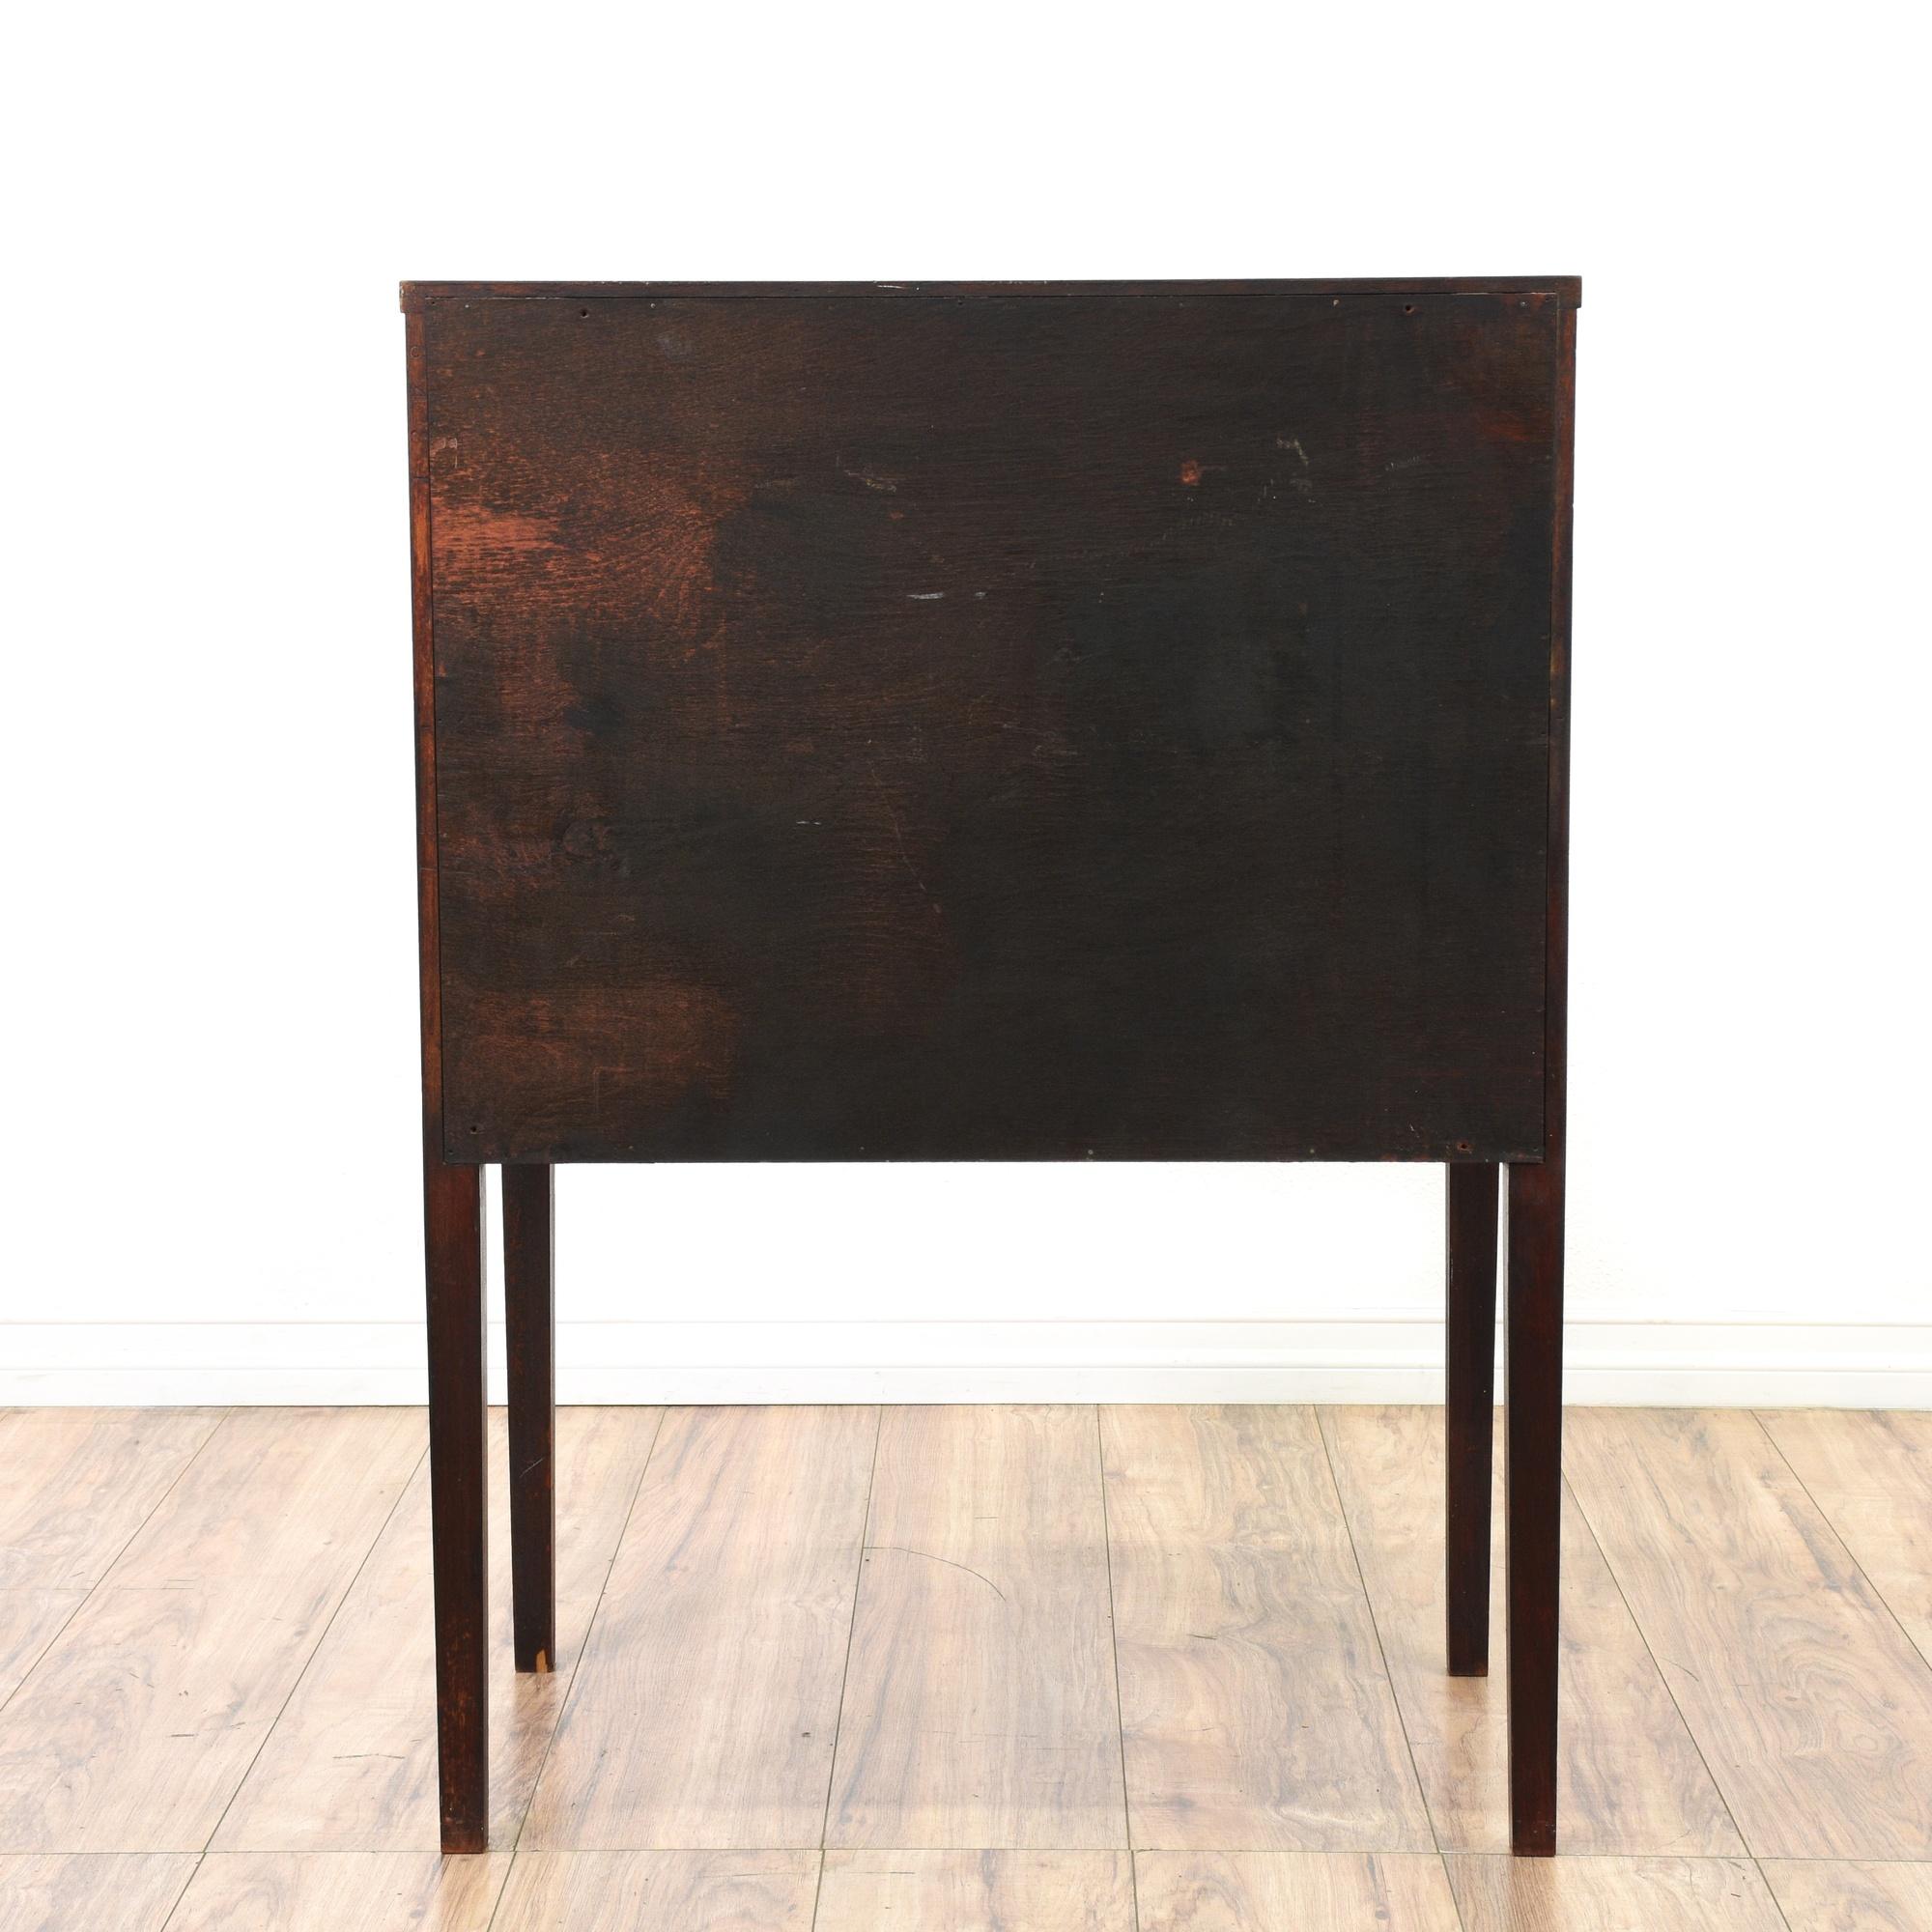 Highly Rated Craftsman fice Furniture Los Angeles Ca ‹ htpcworks